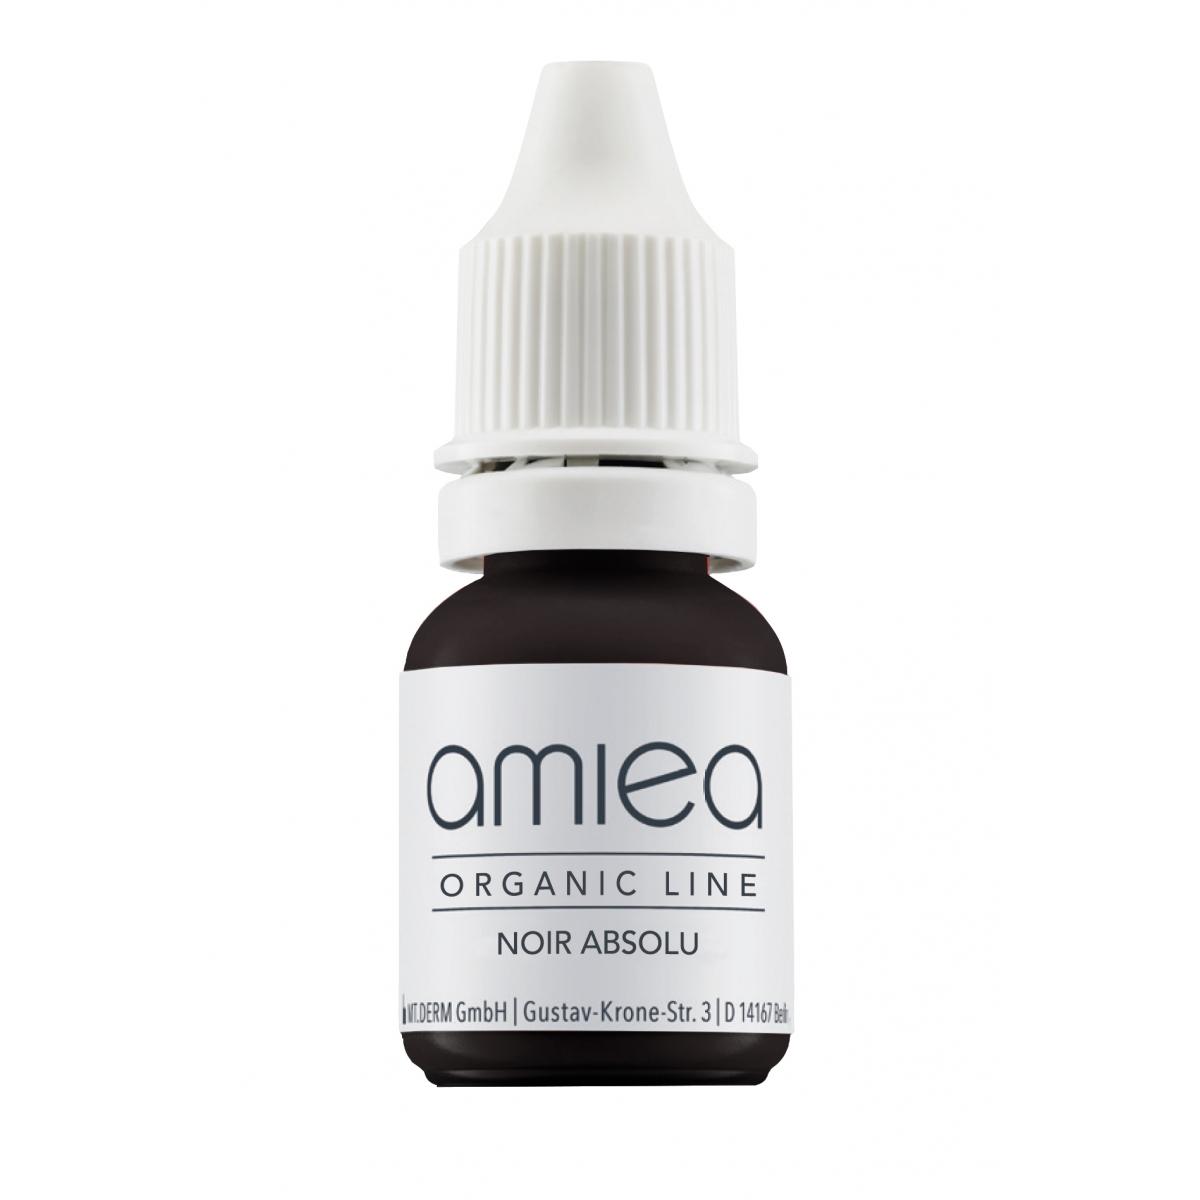 ORGANIC LINE (5ml)  - PIGMENT NOIR ABSOLU ORGANICLINE AMIEA (5 ml)